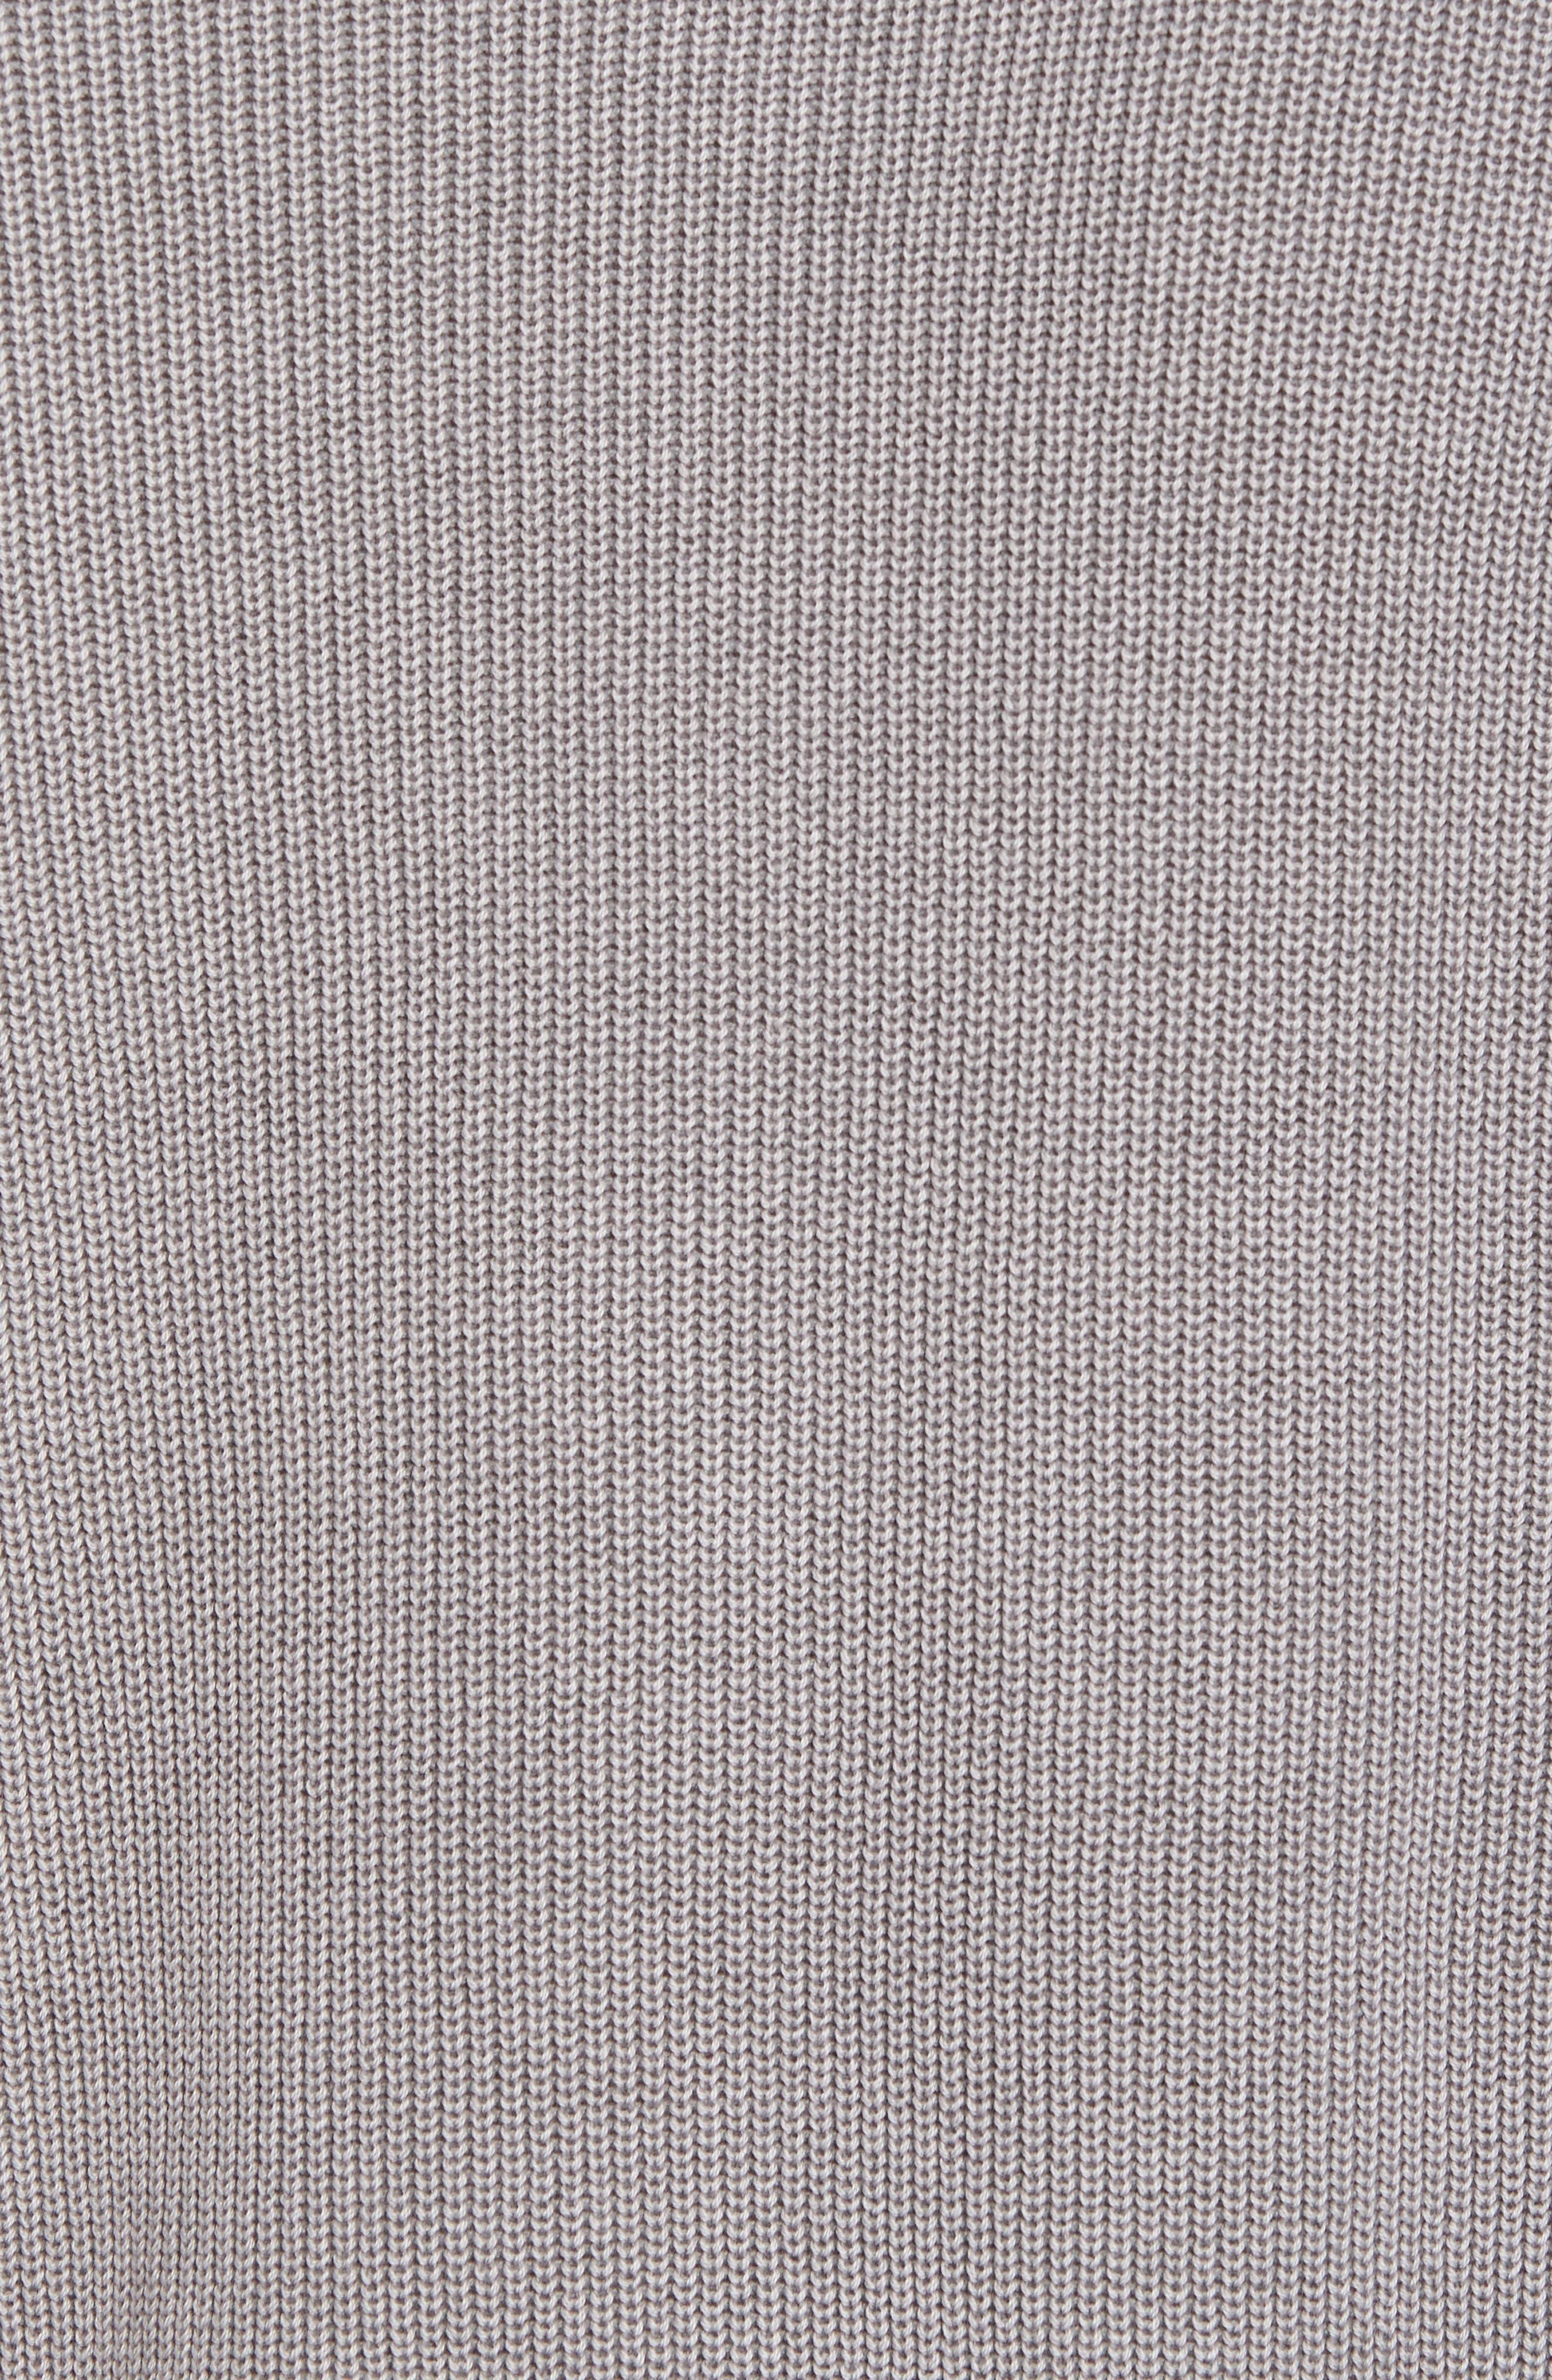 Crewneck Sweater,                             Alternate thumbnail 6, color,                             Grey Weather